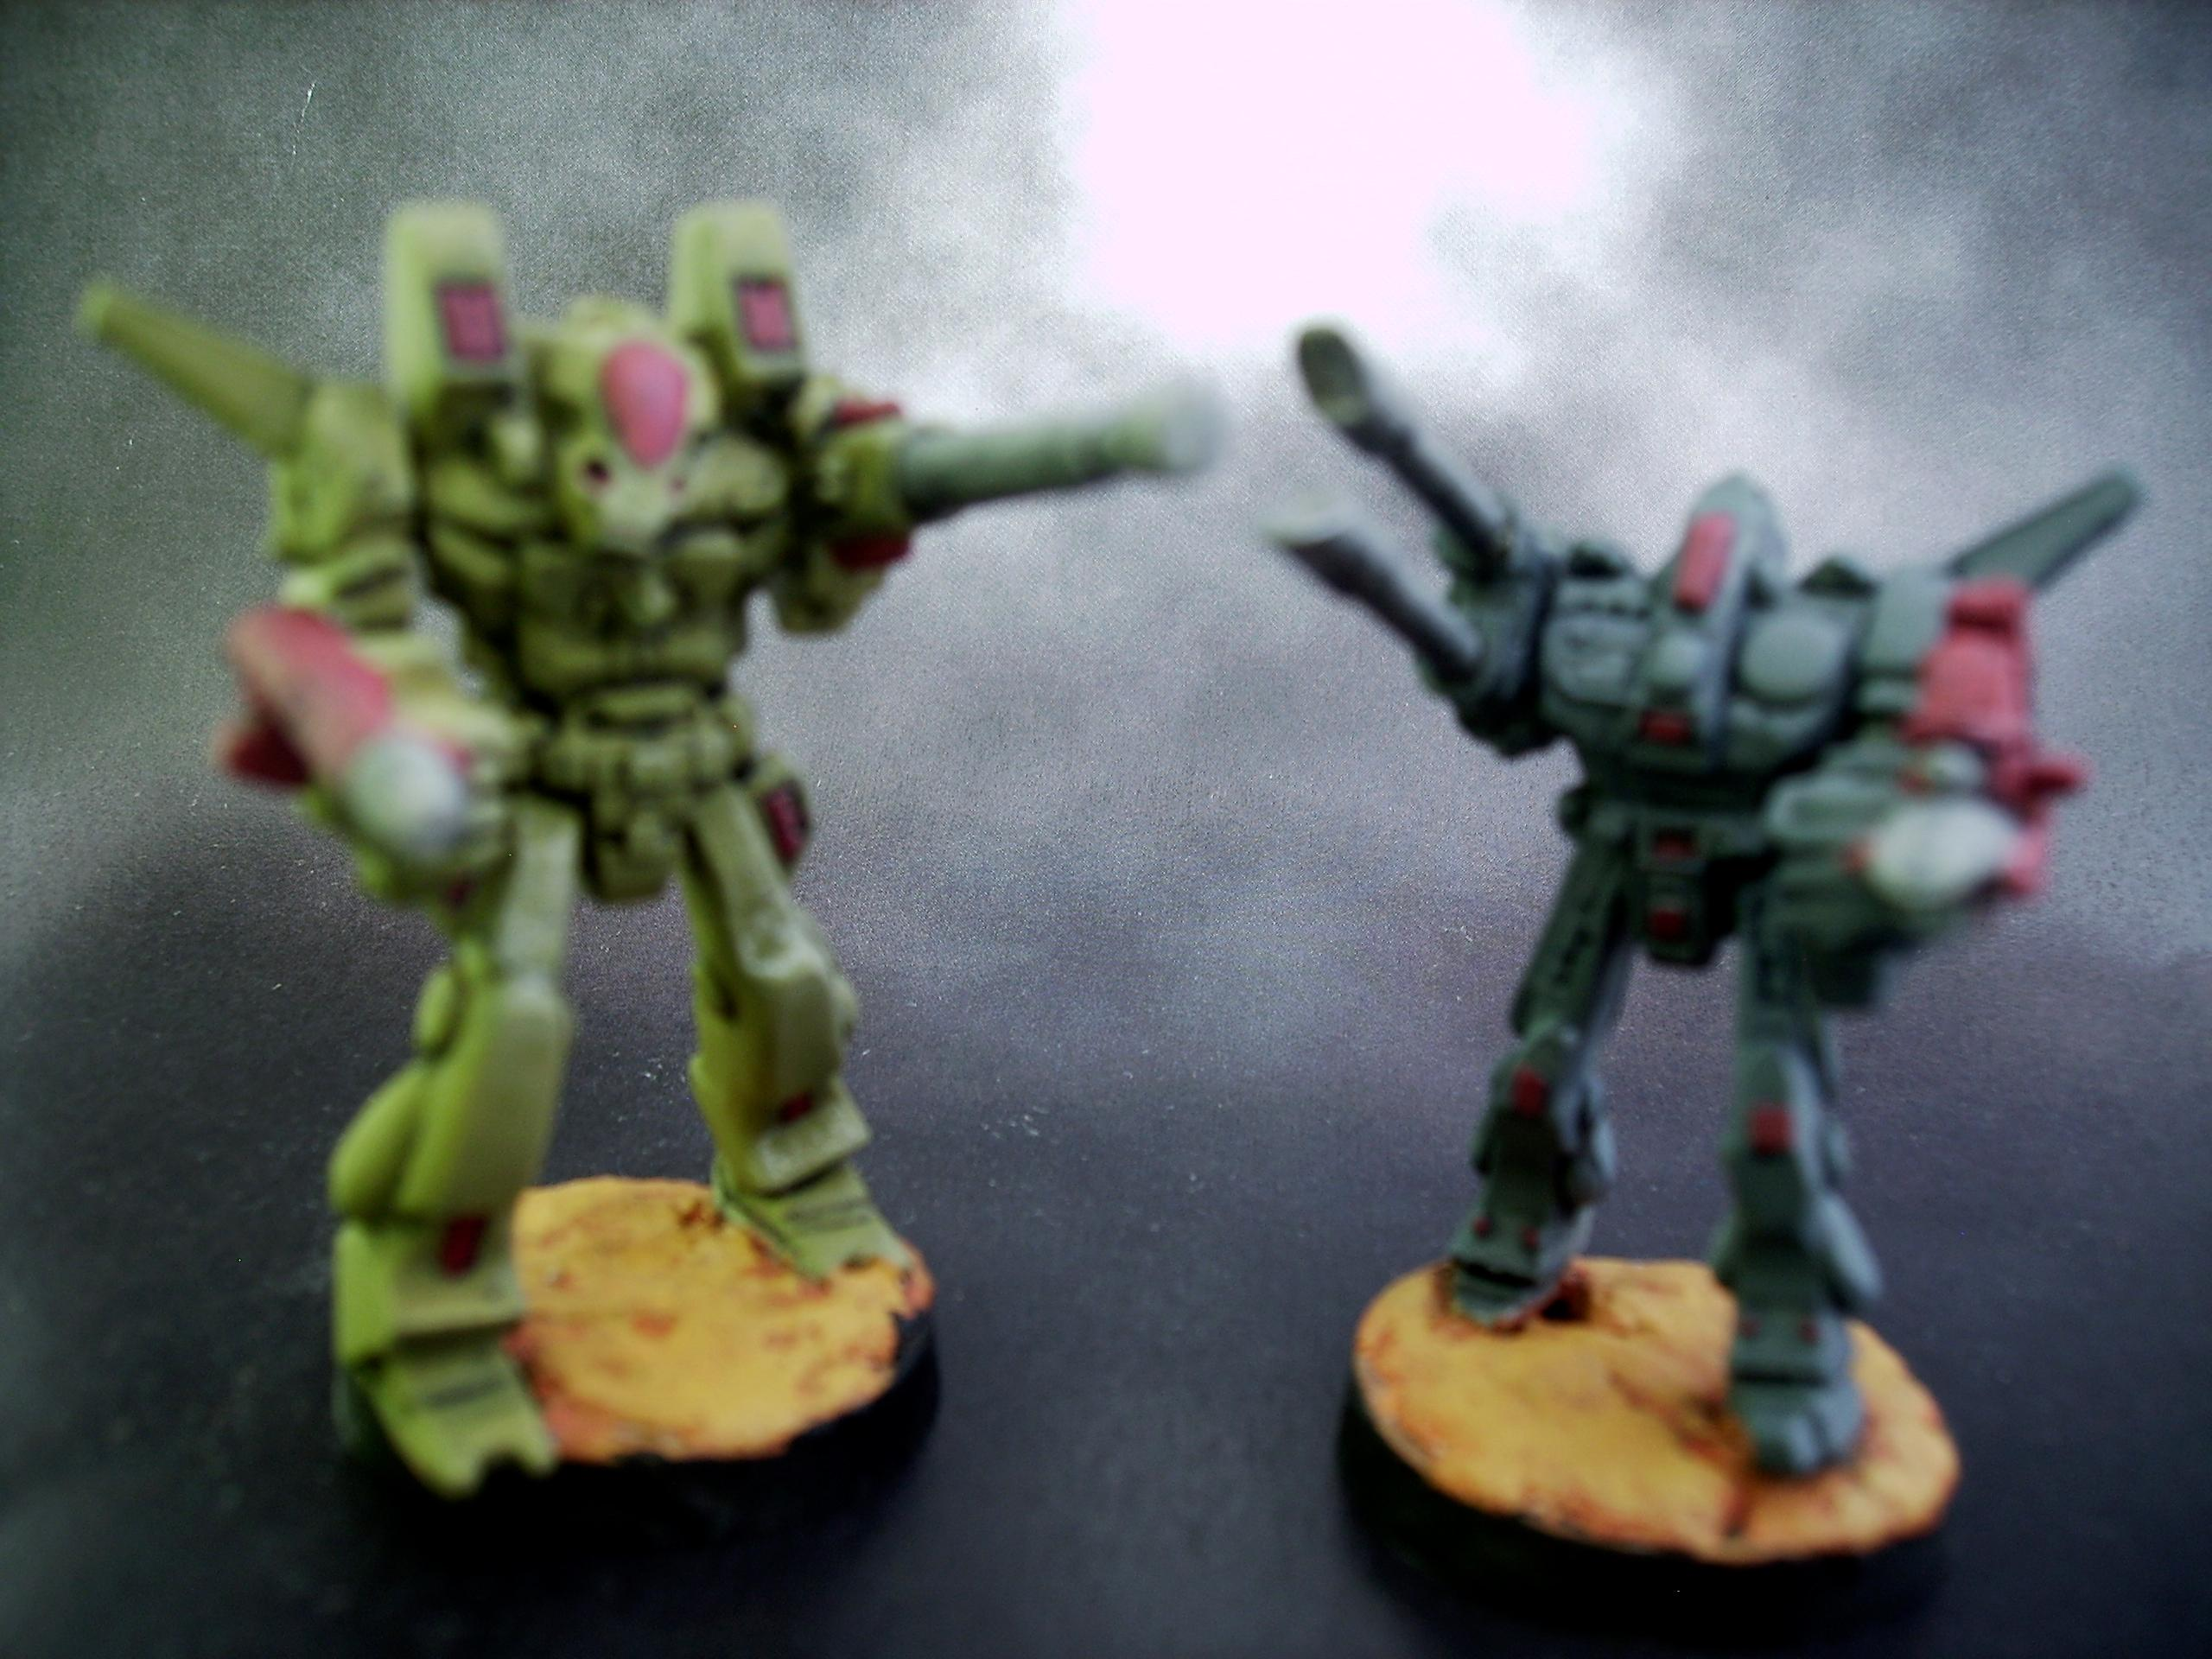 Mutants And Deathrays, Post Aopocalypse, Post Apoc